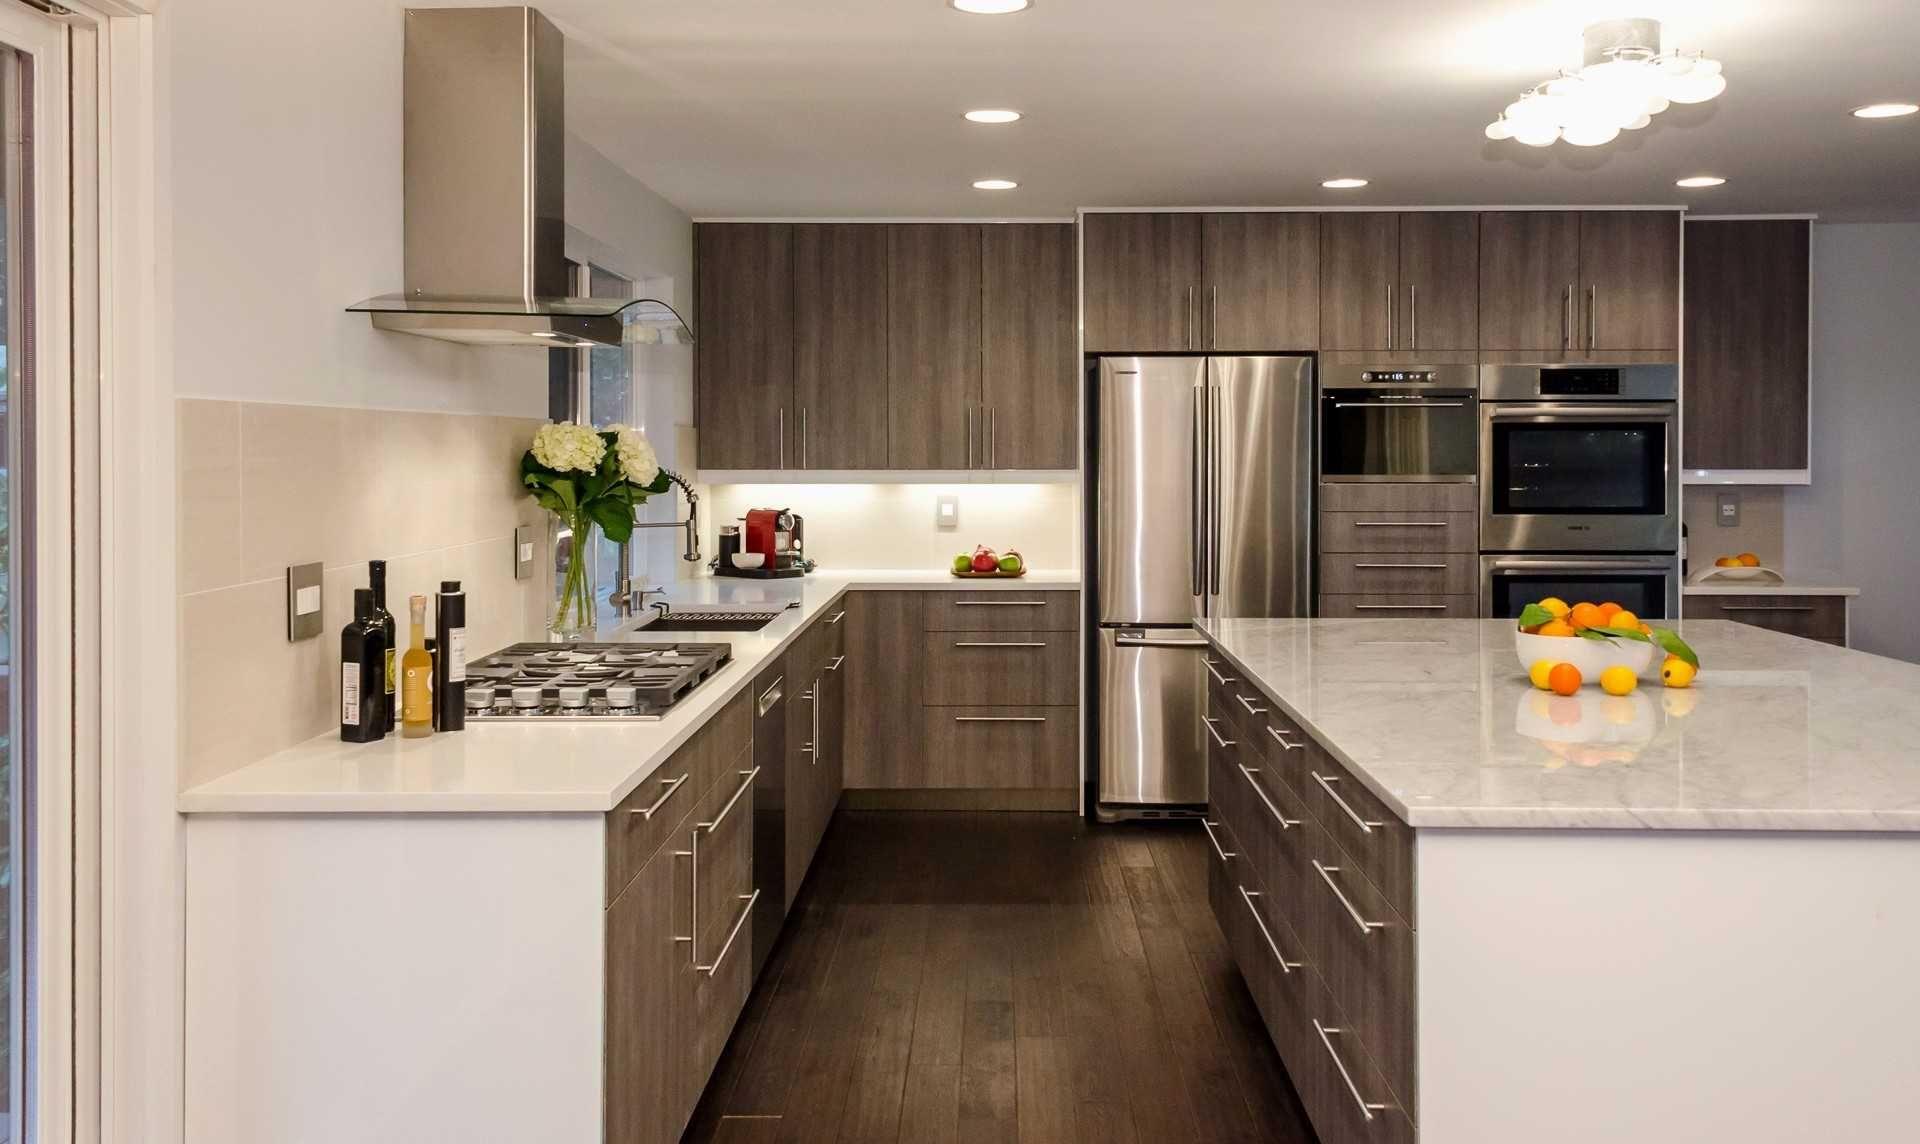 Kitchen Cabinets Quartz Countertops Amazing Countertops Best